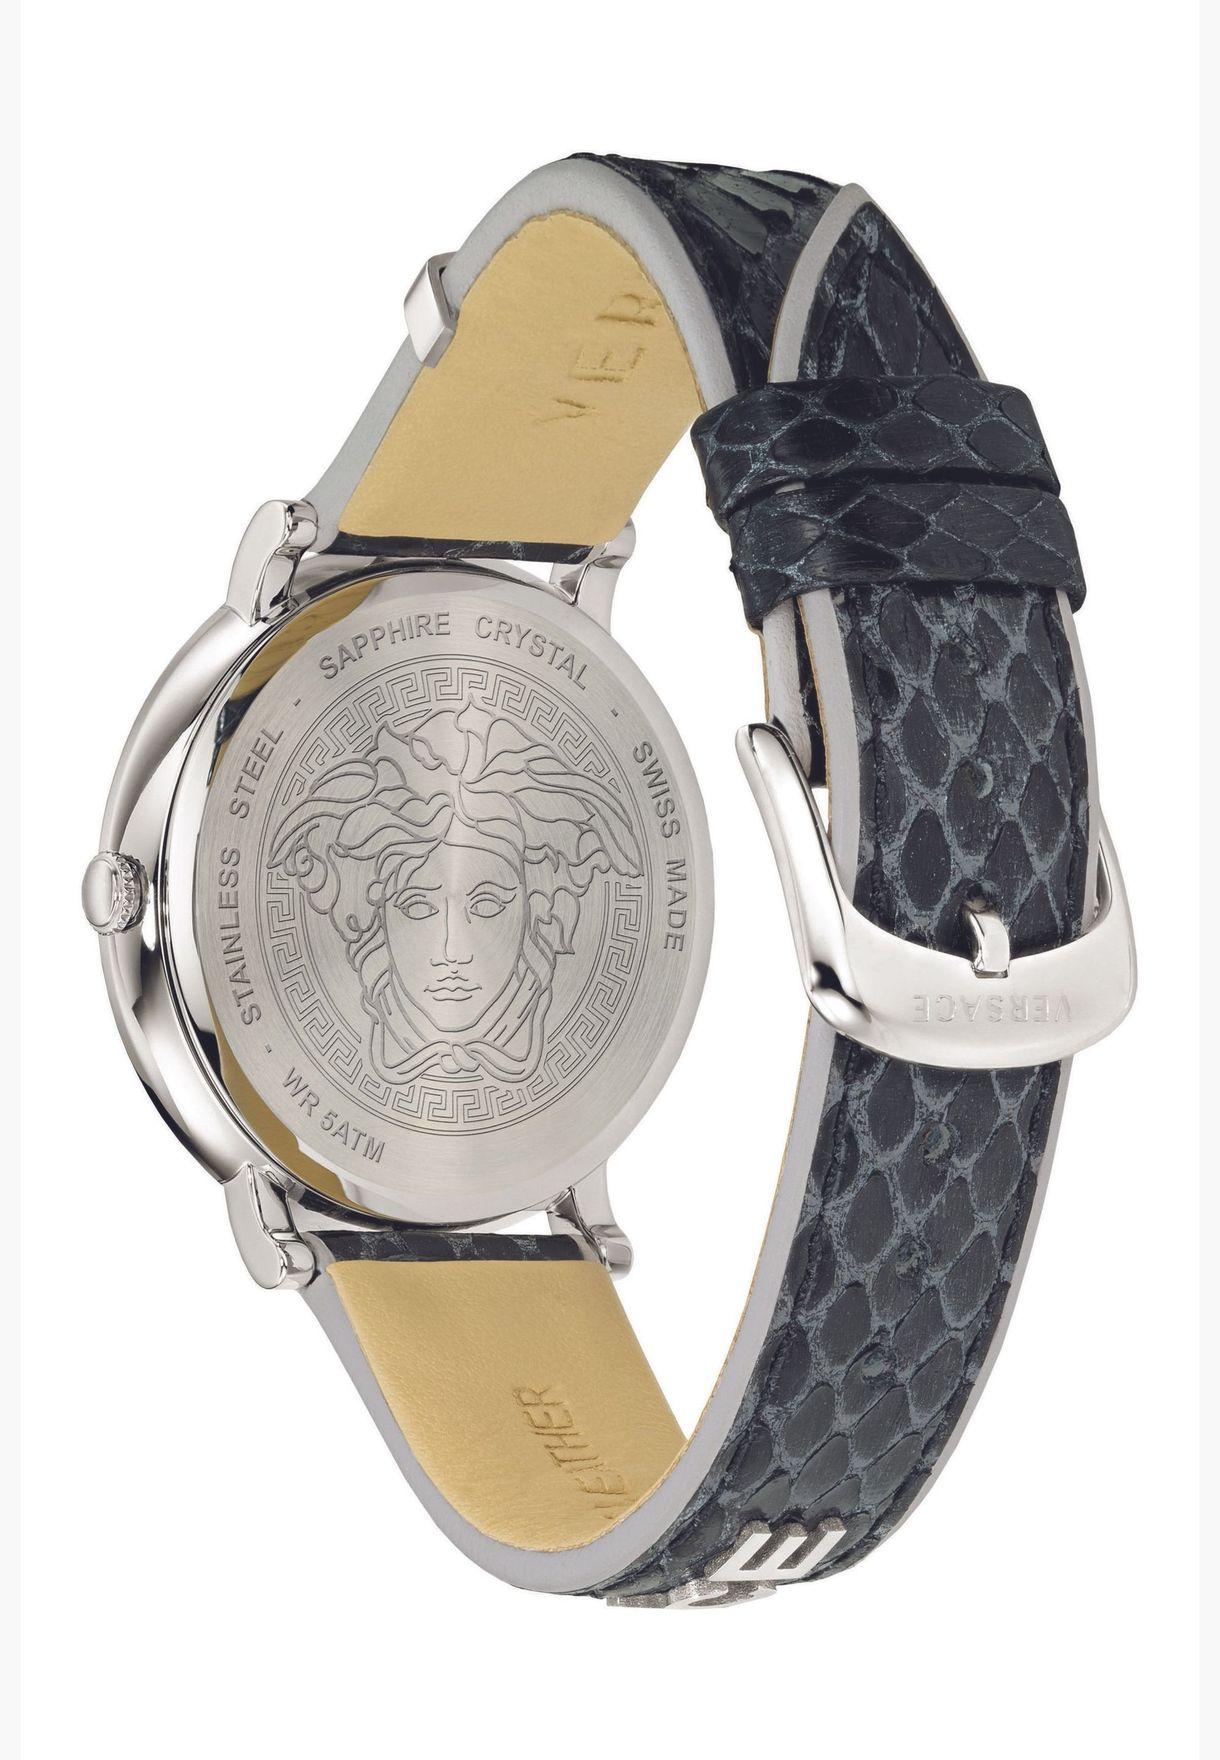 ساعة فيرساتشي سيركل بسوار جلدي للنساء - VE8100919